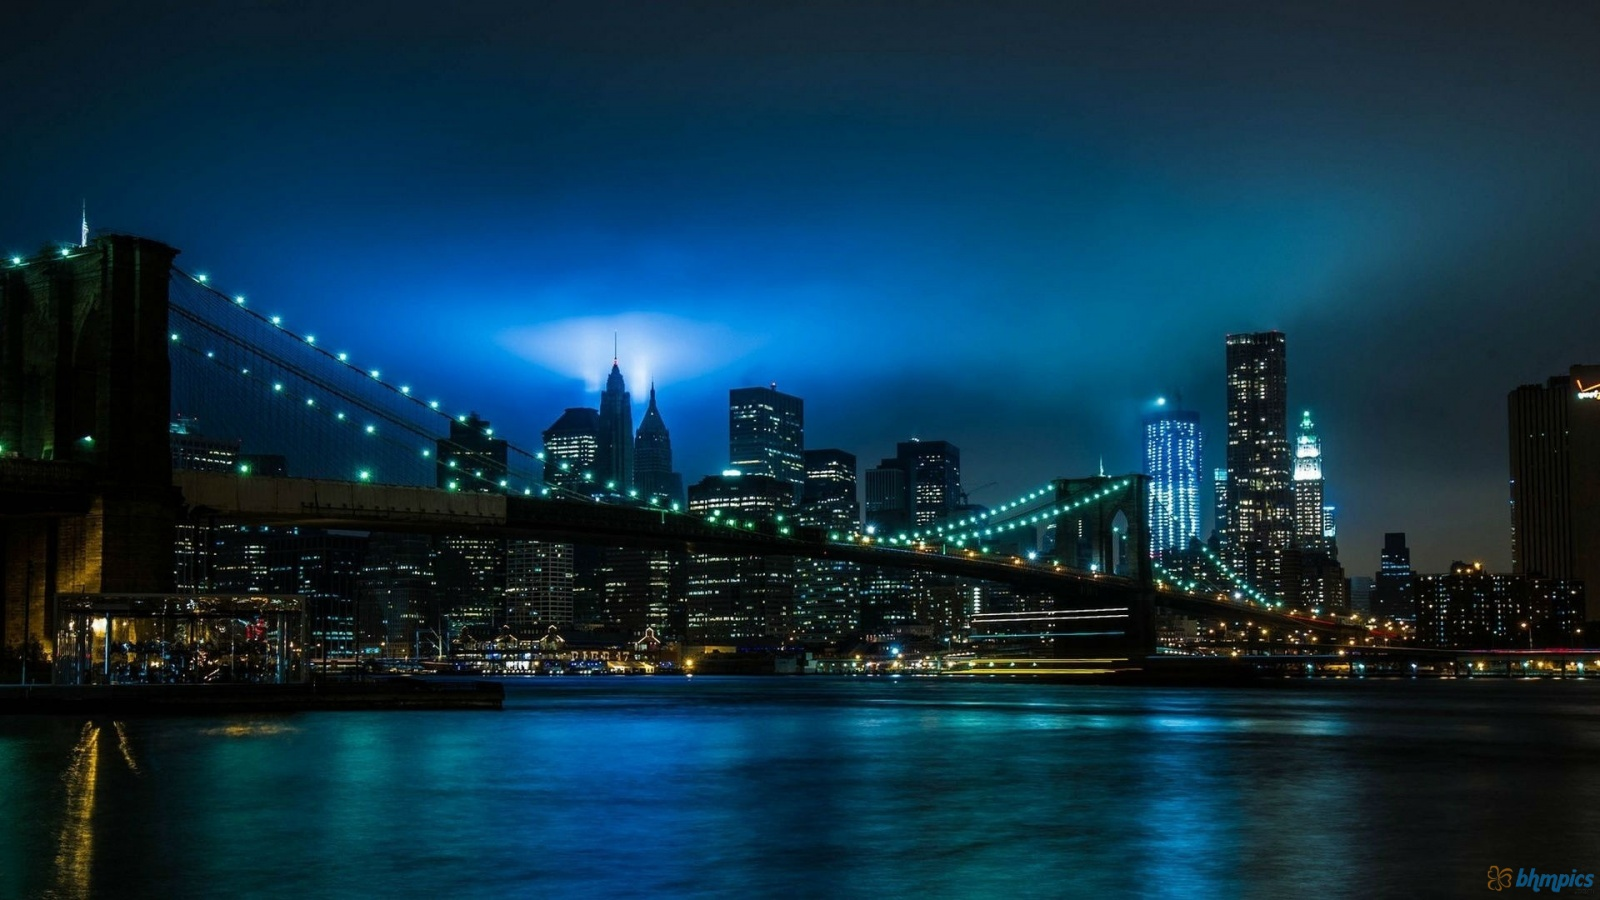 New York At Night Wallpaper 1600x900